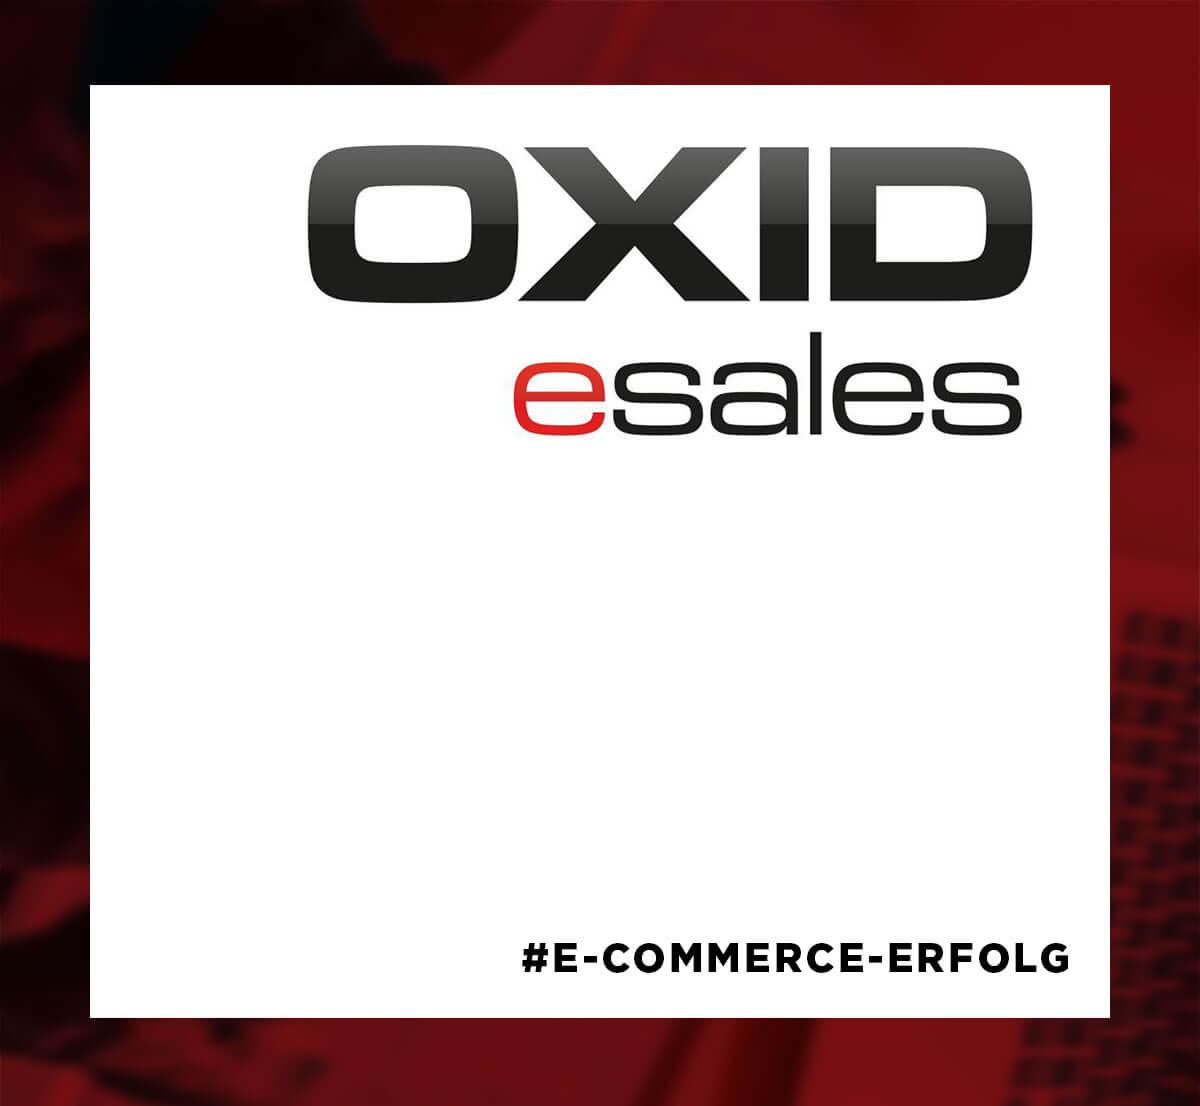 Abbildung Logo OXID